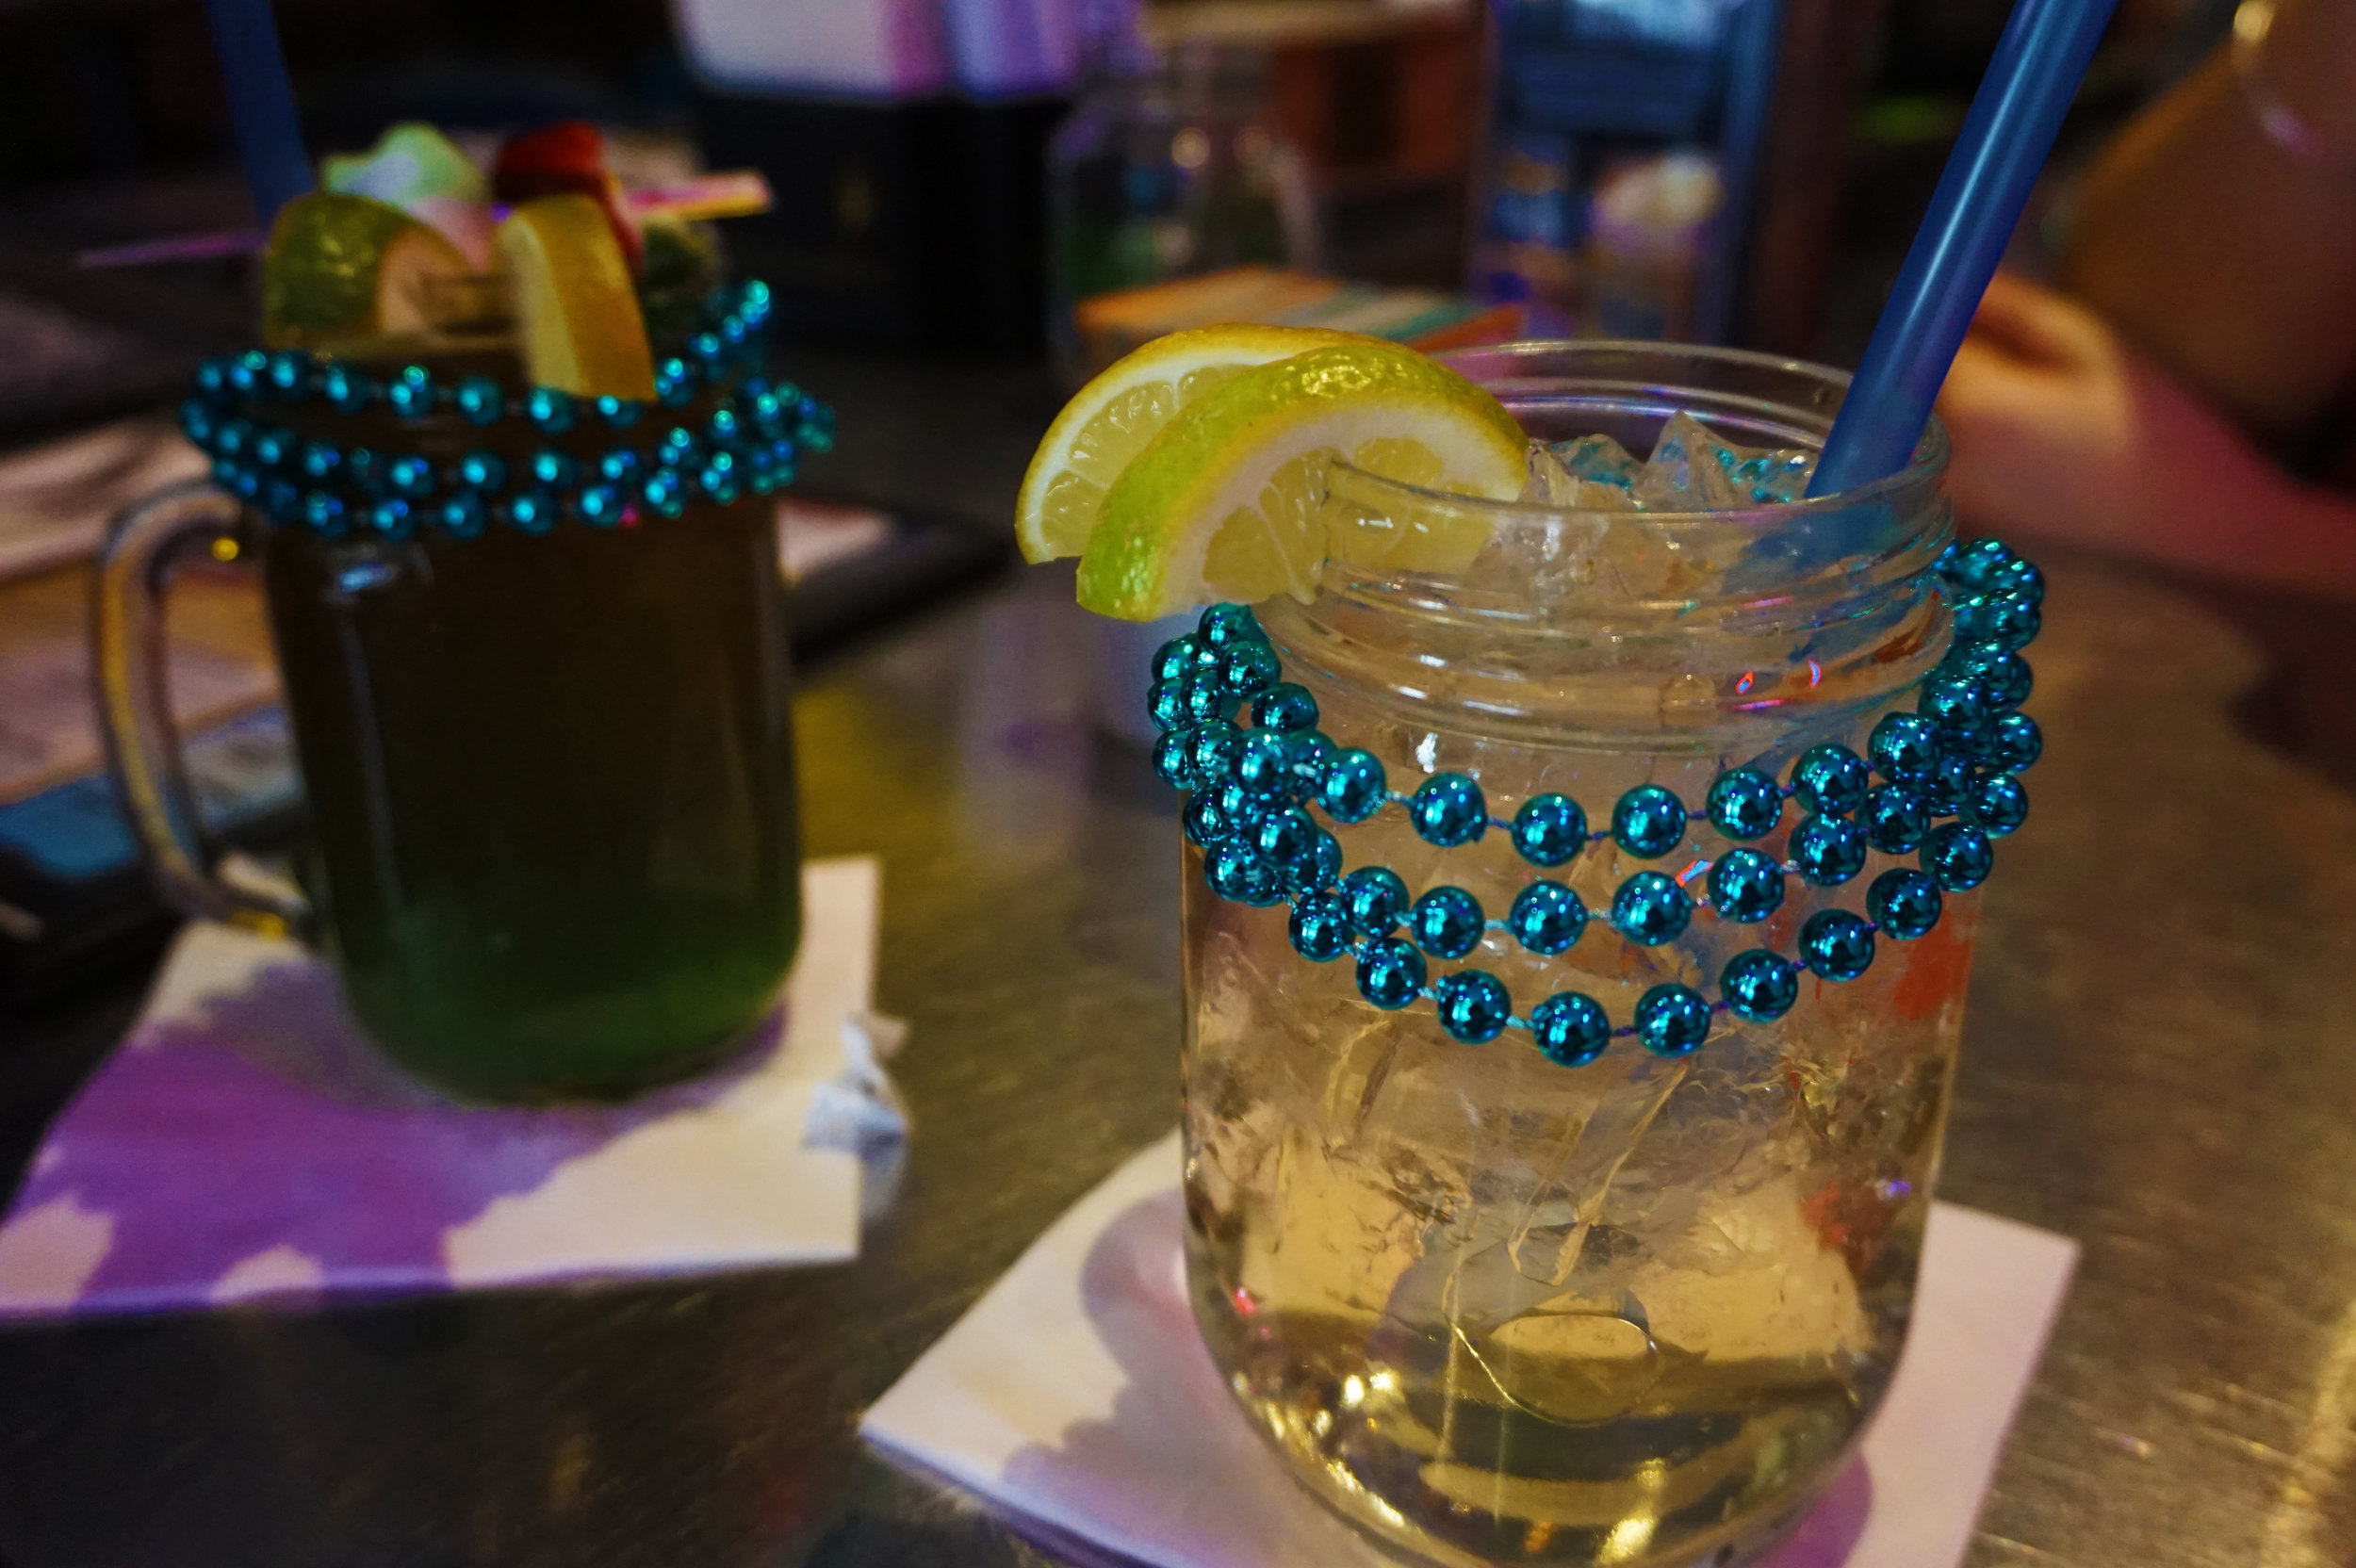 Voodoo juice (peep the gummy shark!) and a Texas mule